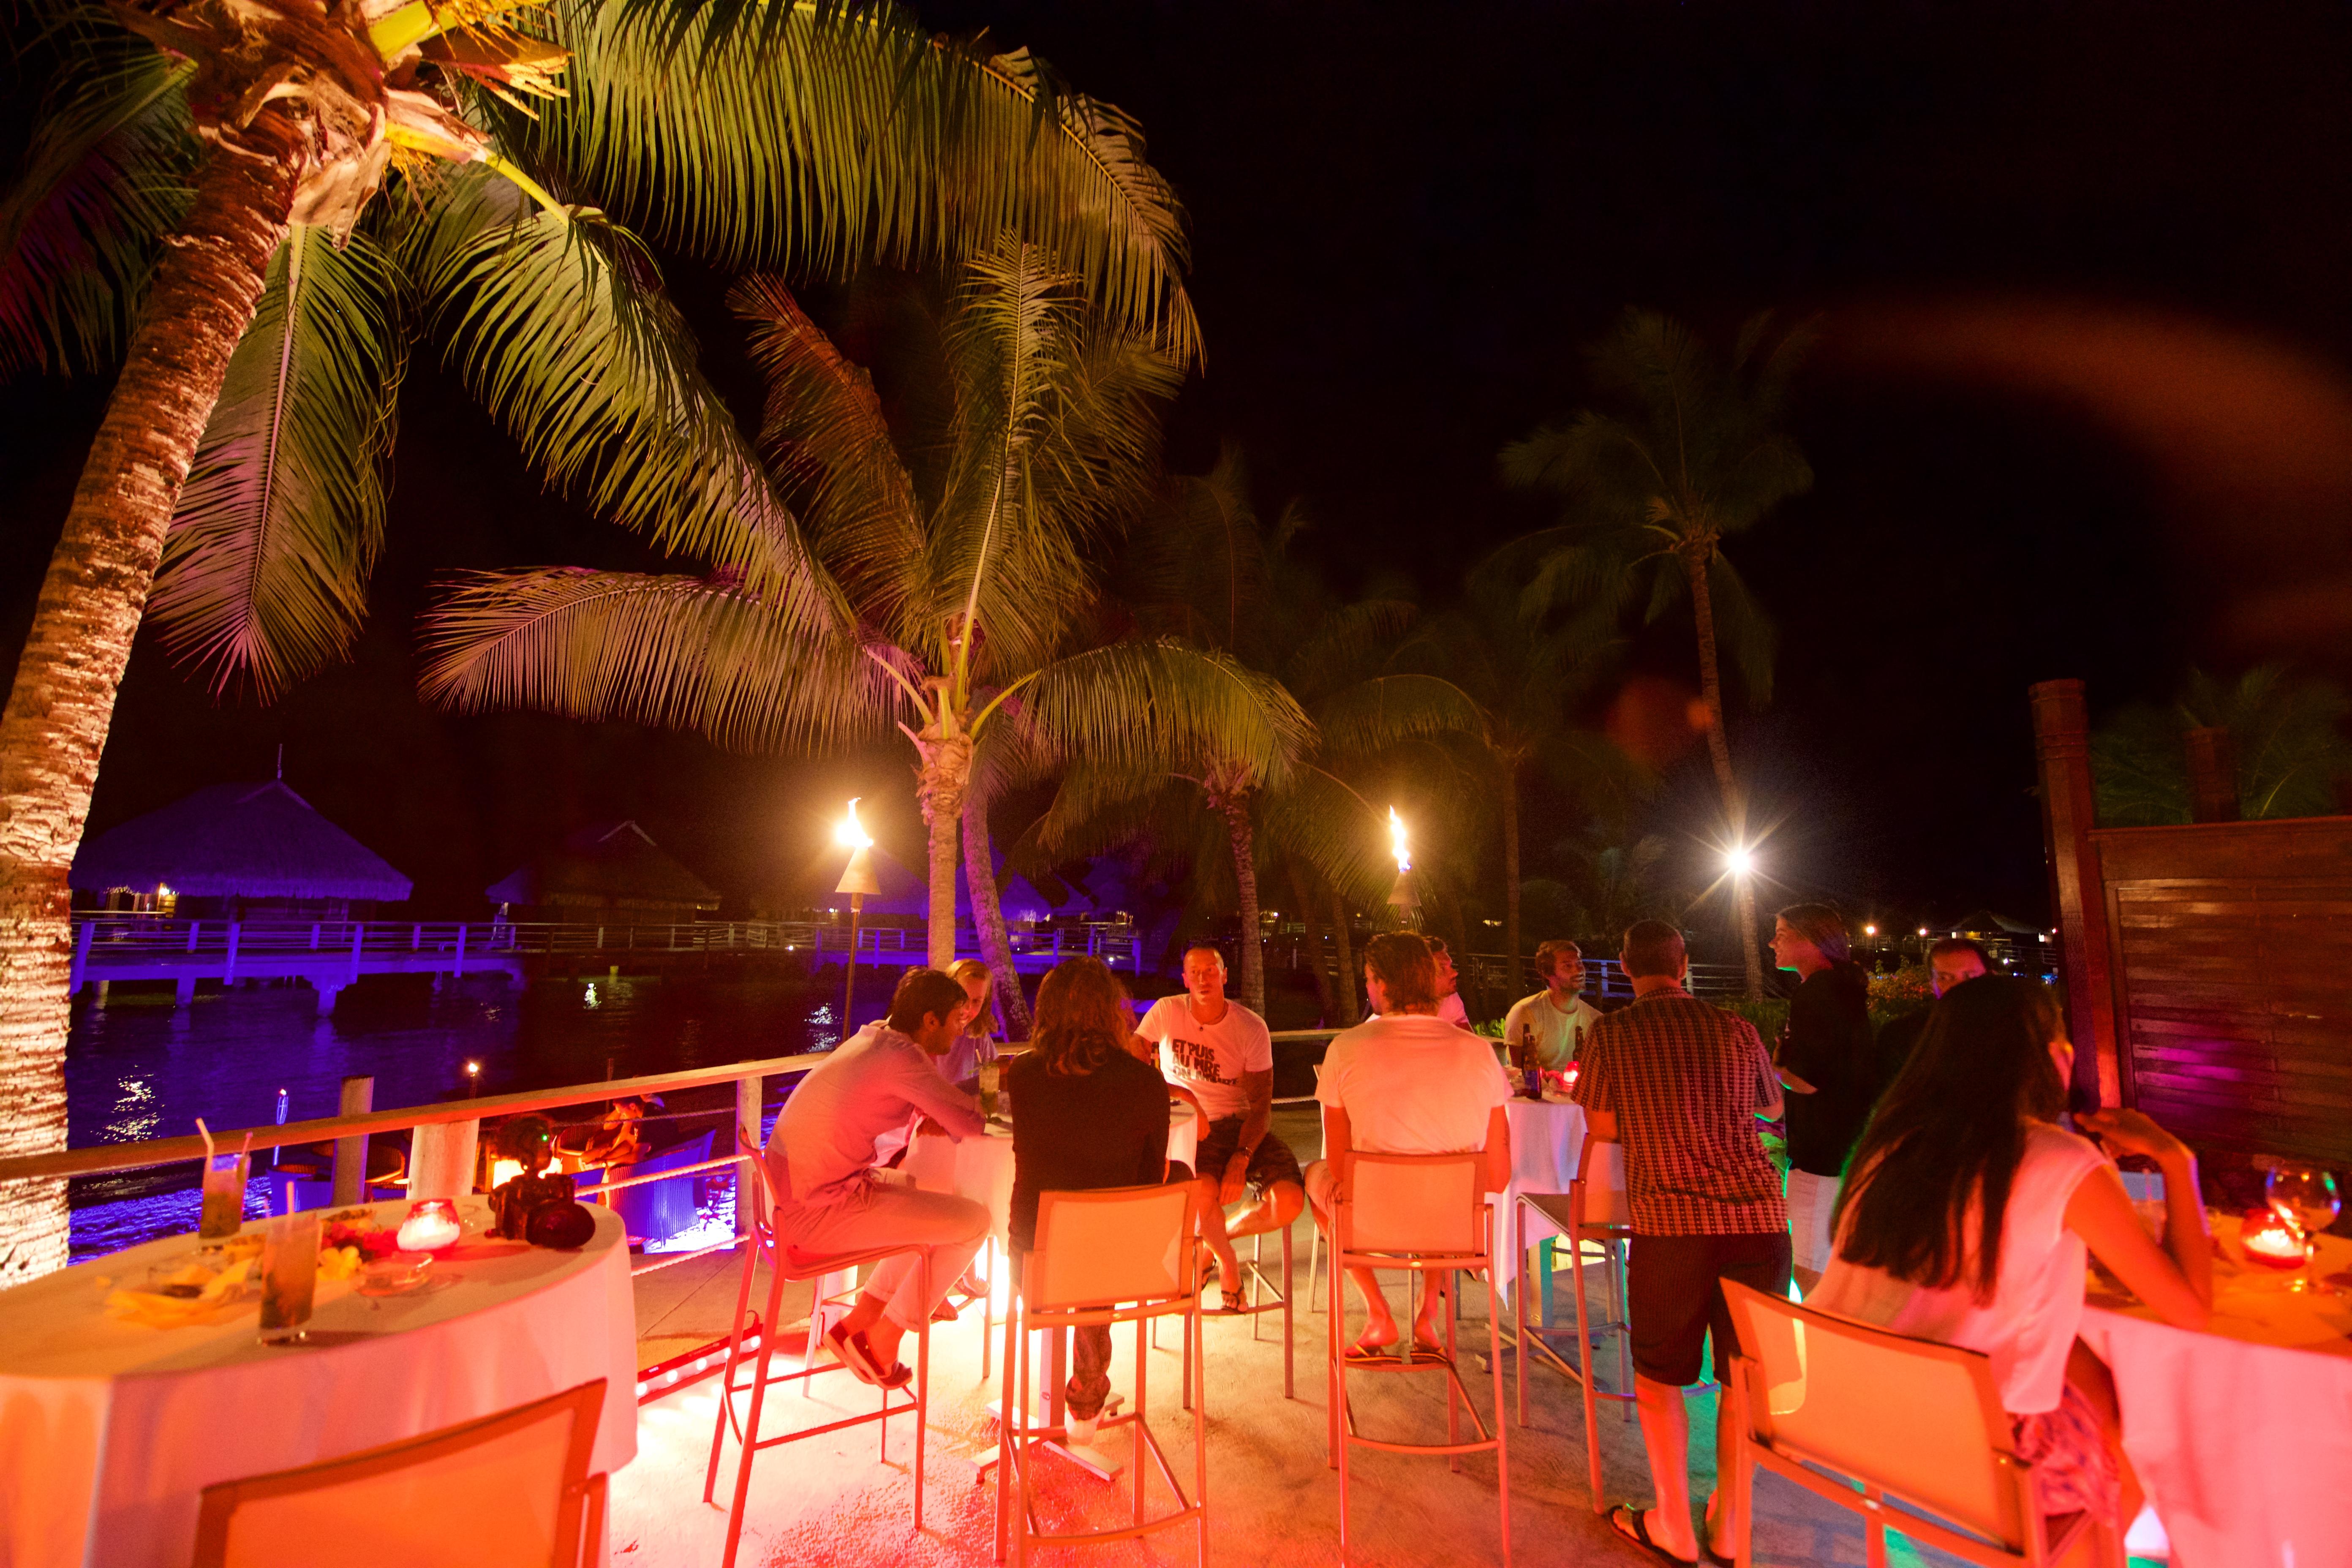 https://tahititourisme.ca/wp-content/uploads/2018/03/RESTAURATION-Matahiehani-Lounge-Bar-featured_image-Tim_McKenna.jpg